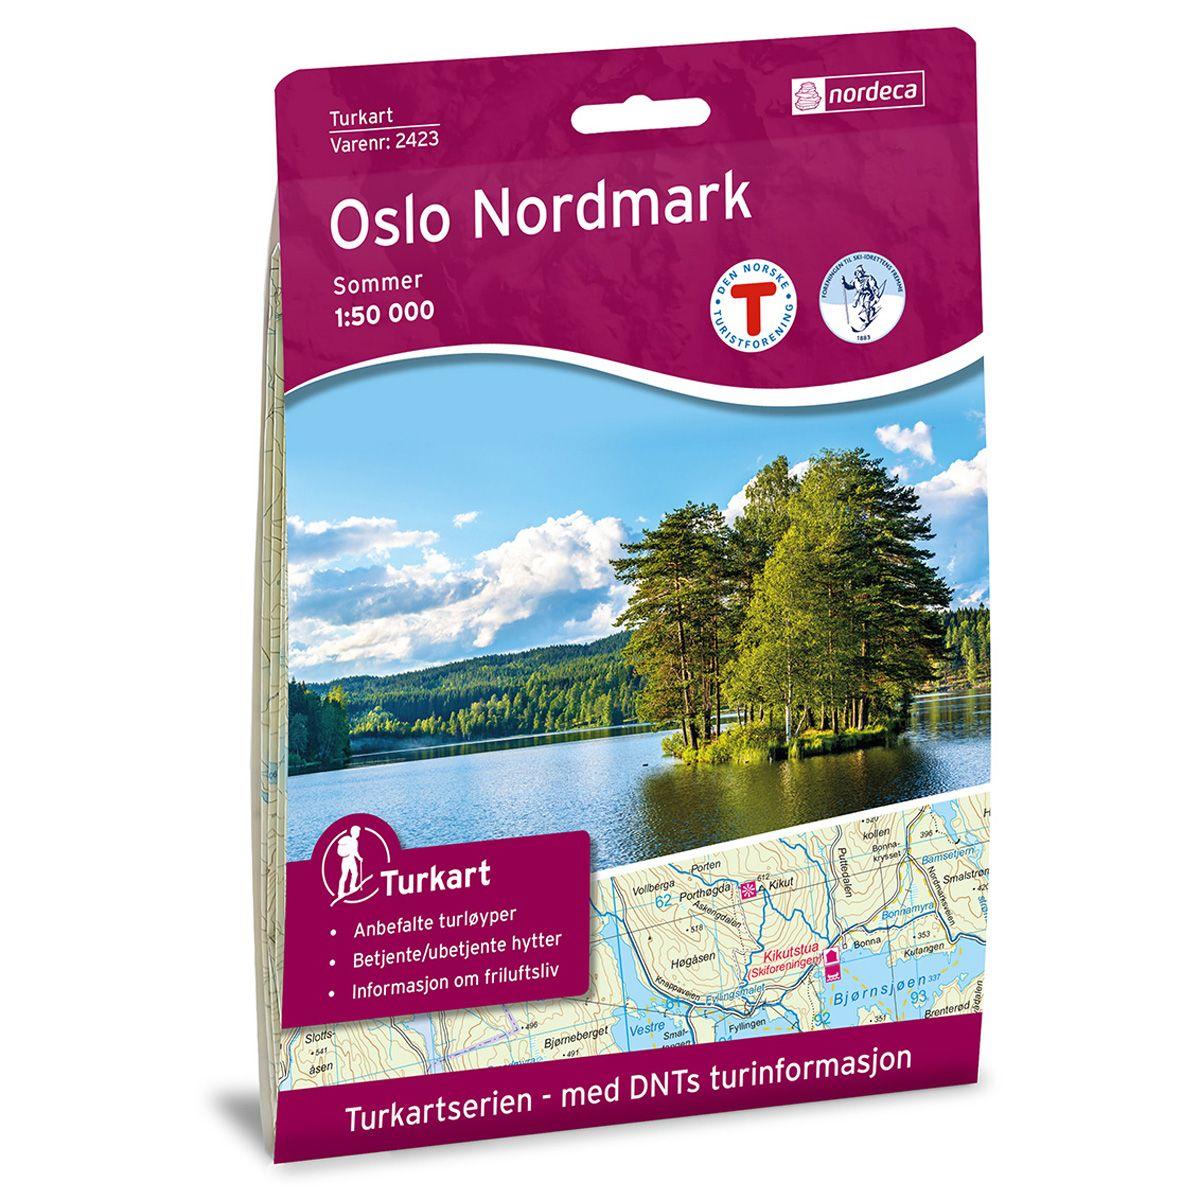 Nordeca  Oslo Nordmark sommer DNT Turkart